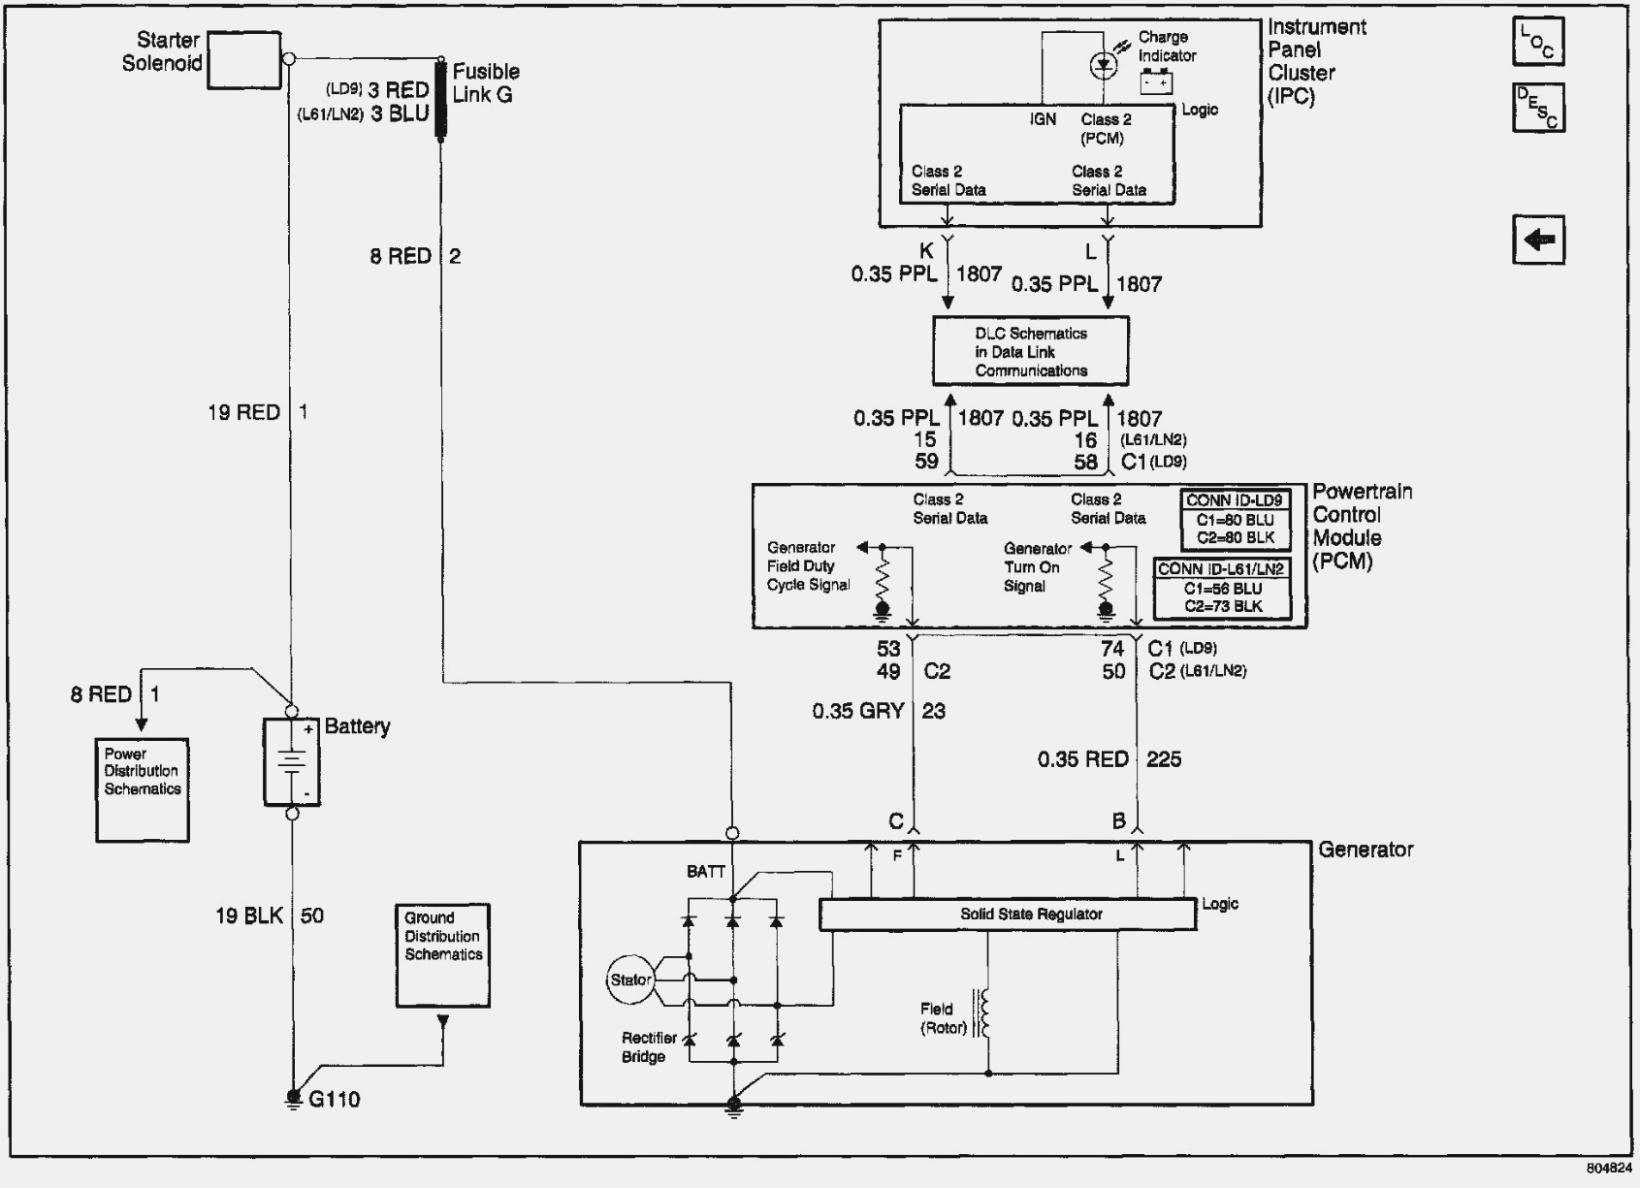 Awesome Isuzu Alternator Wiring Diagram Diagrams Digramssample